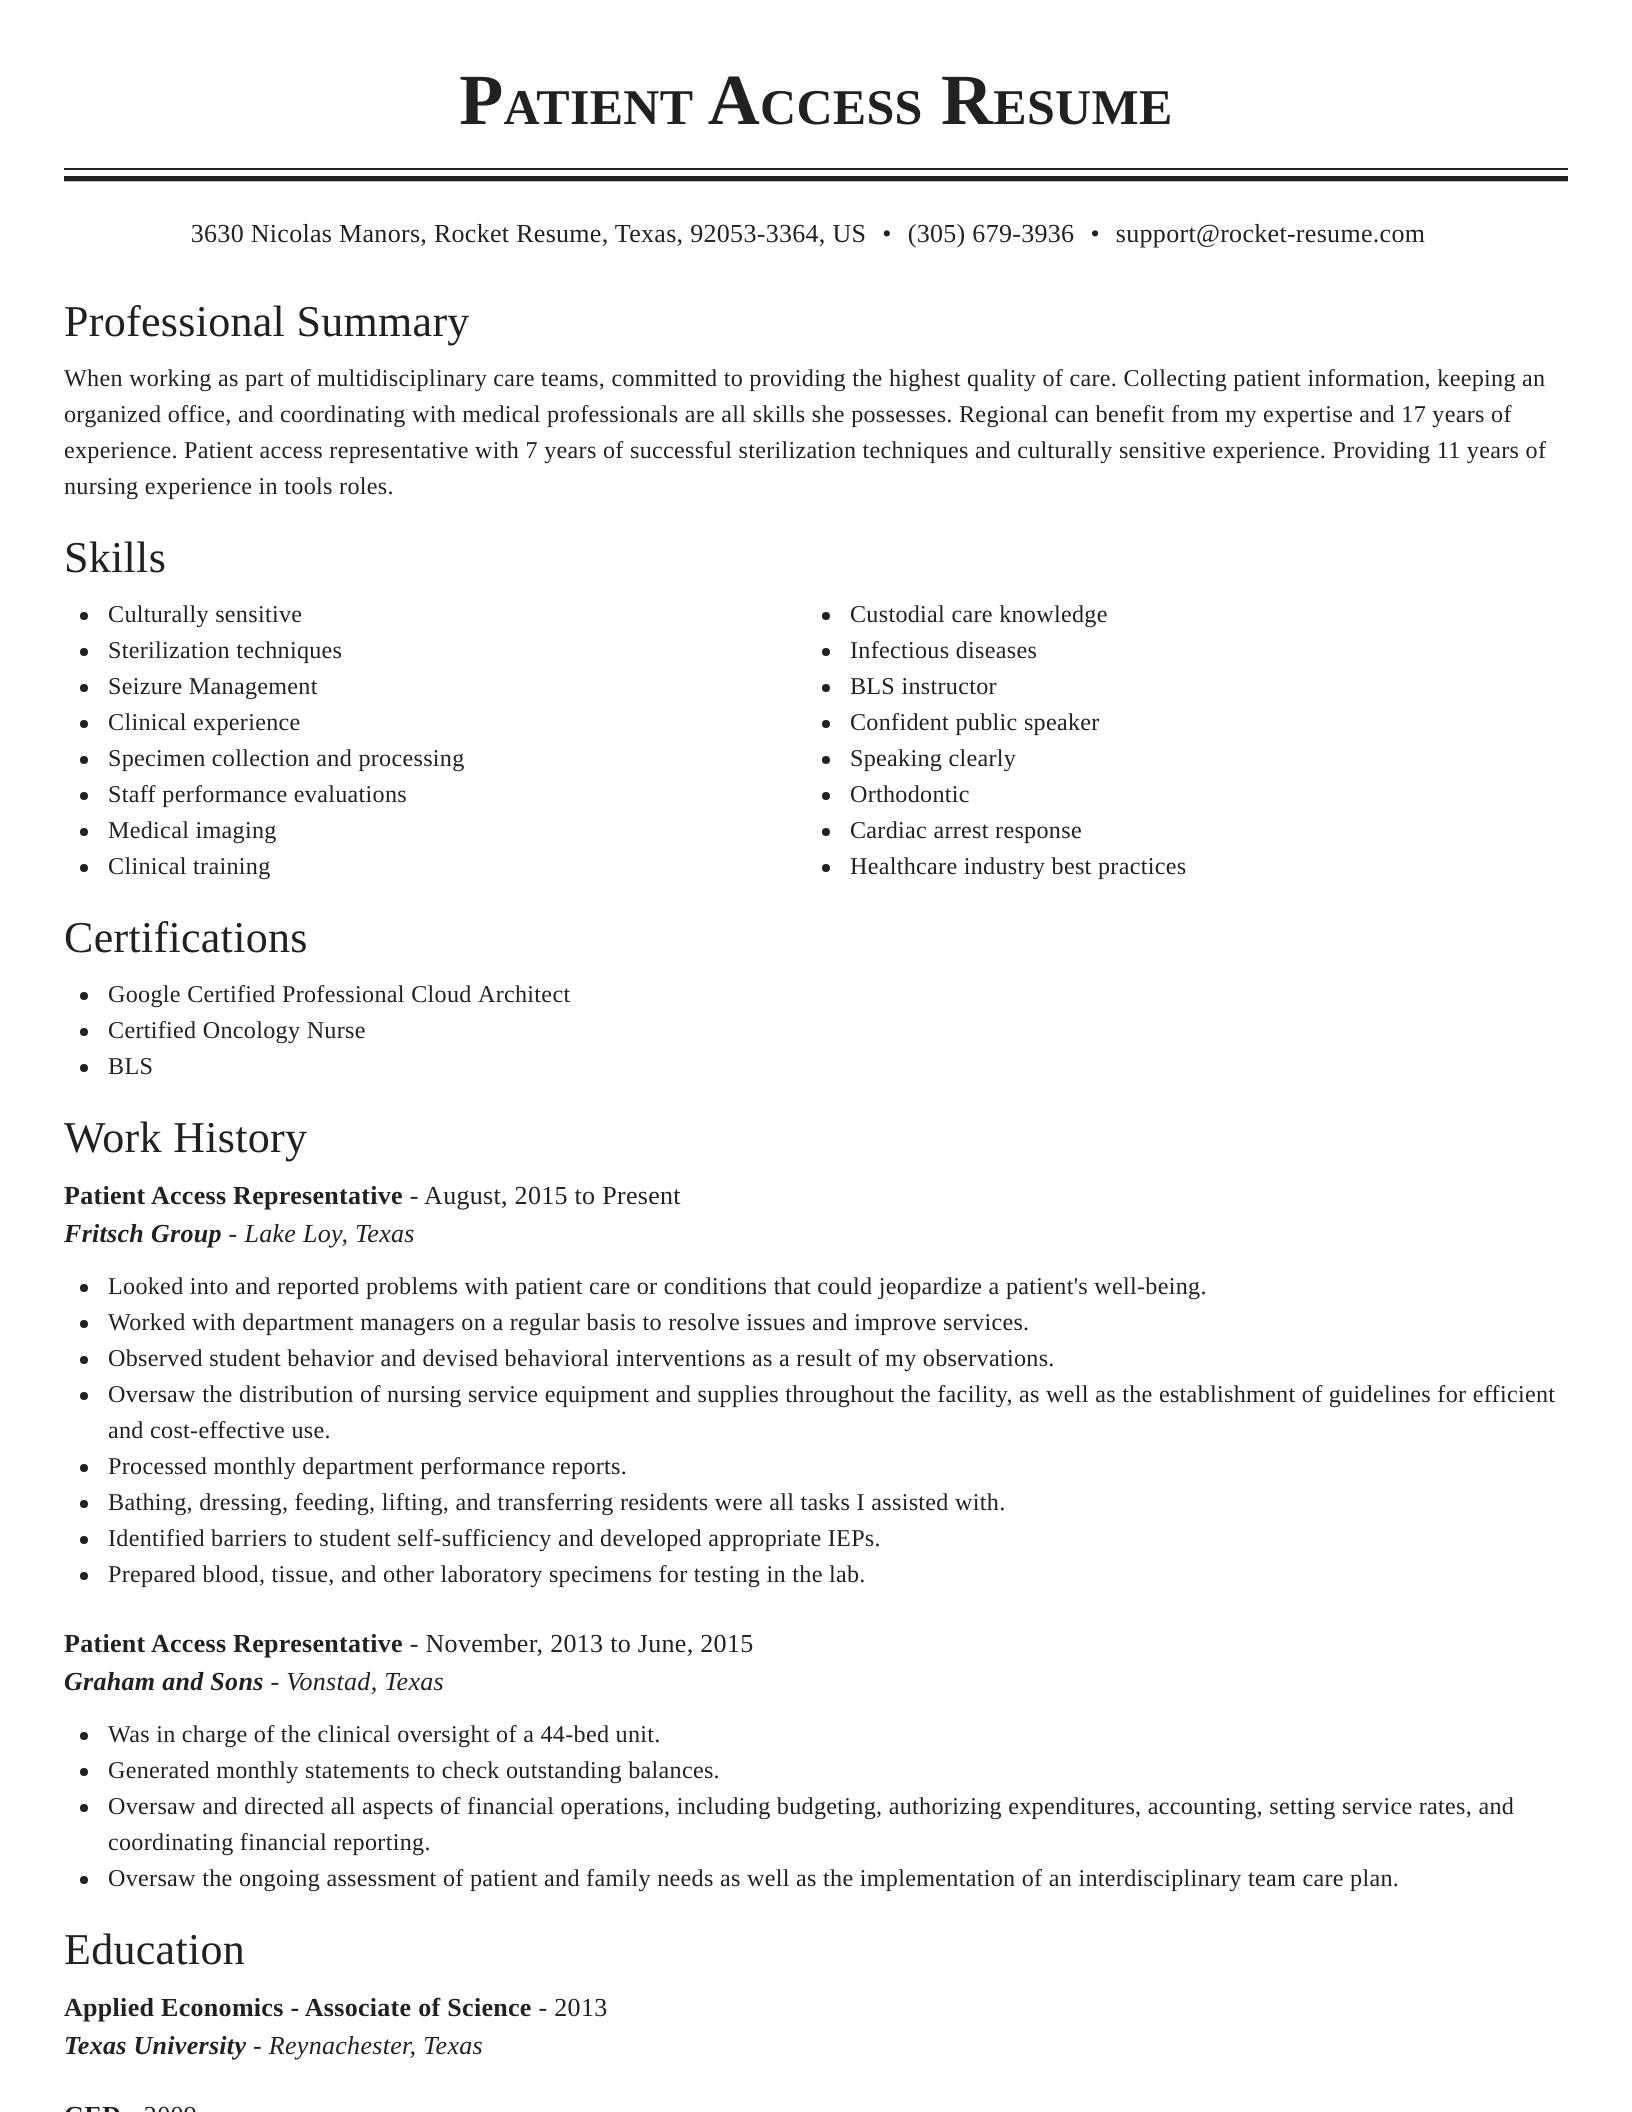 patient access representative resume classic template